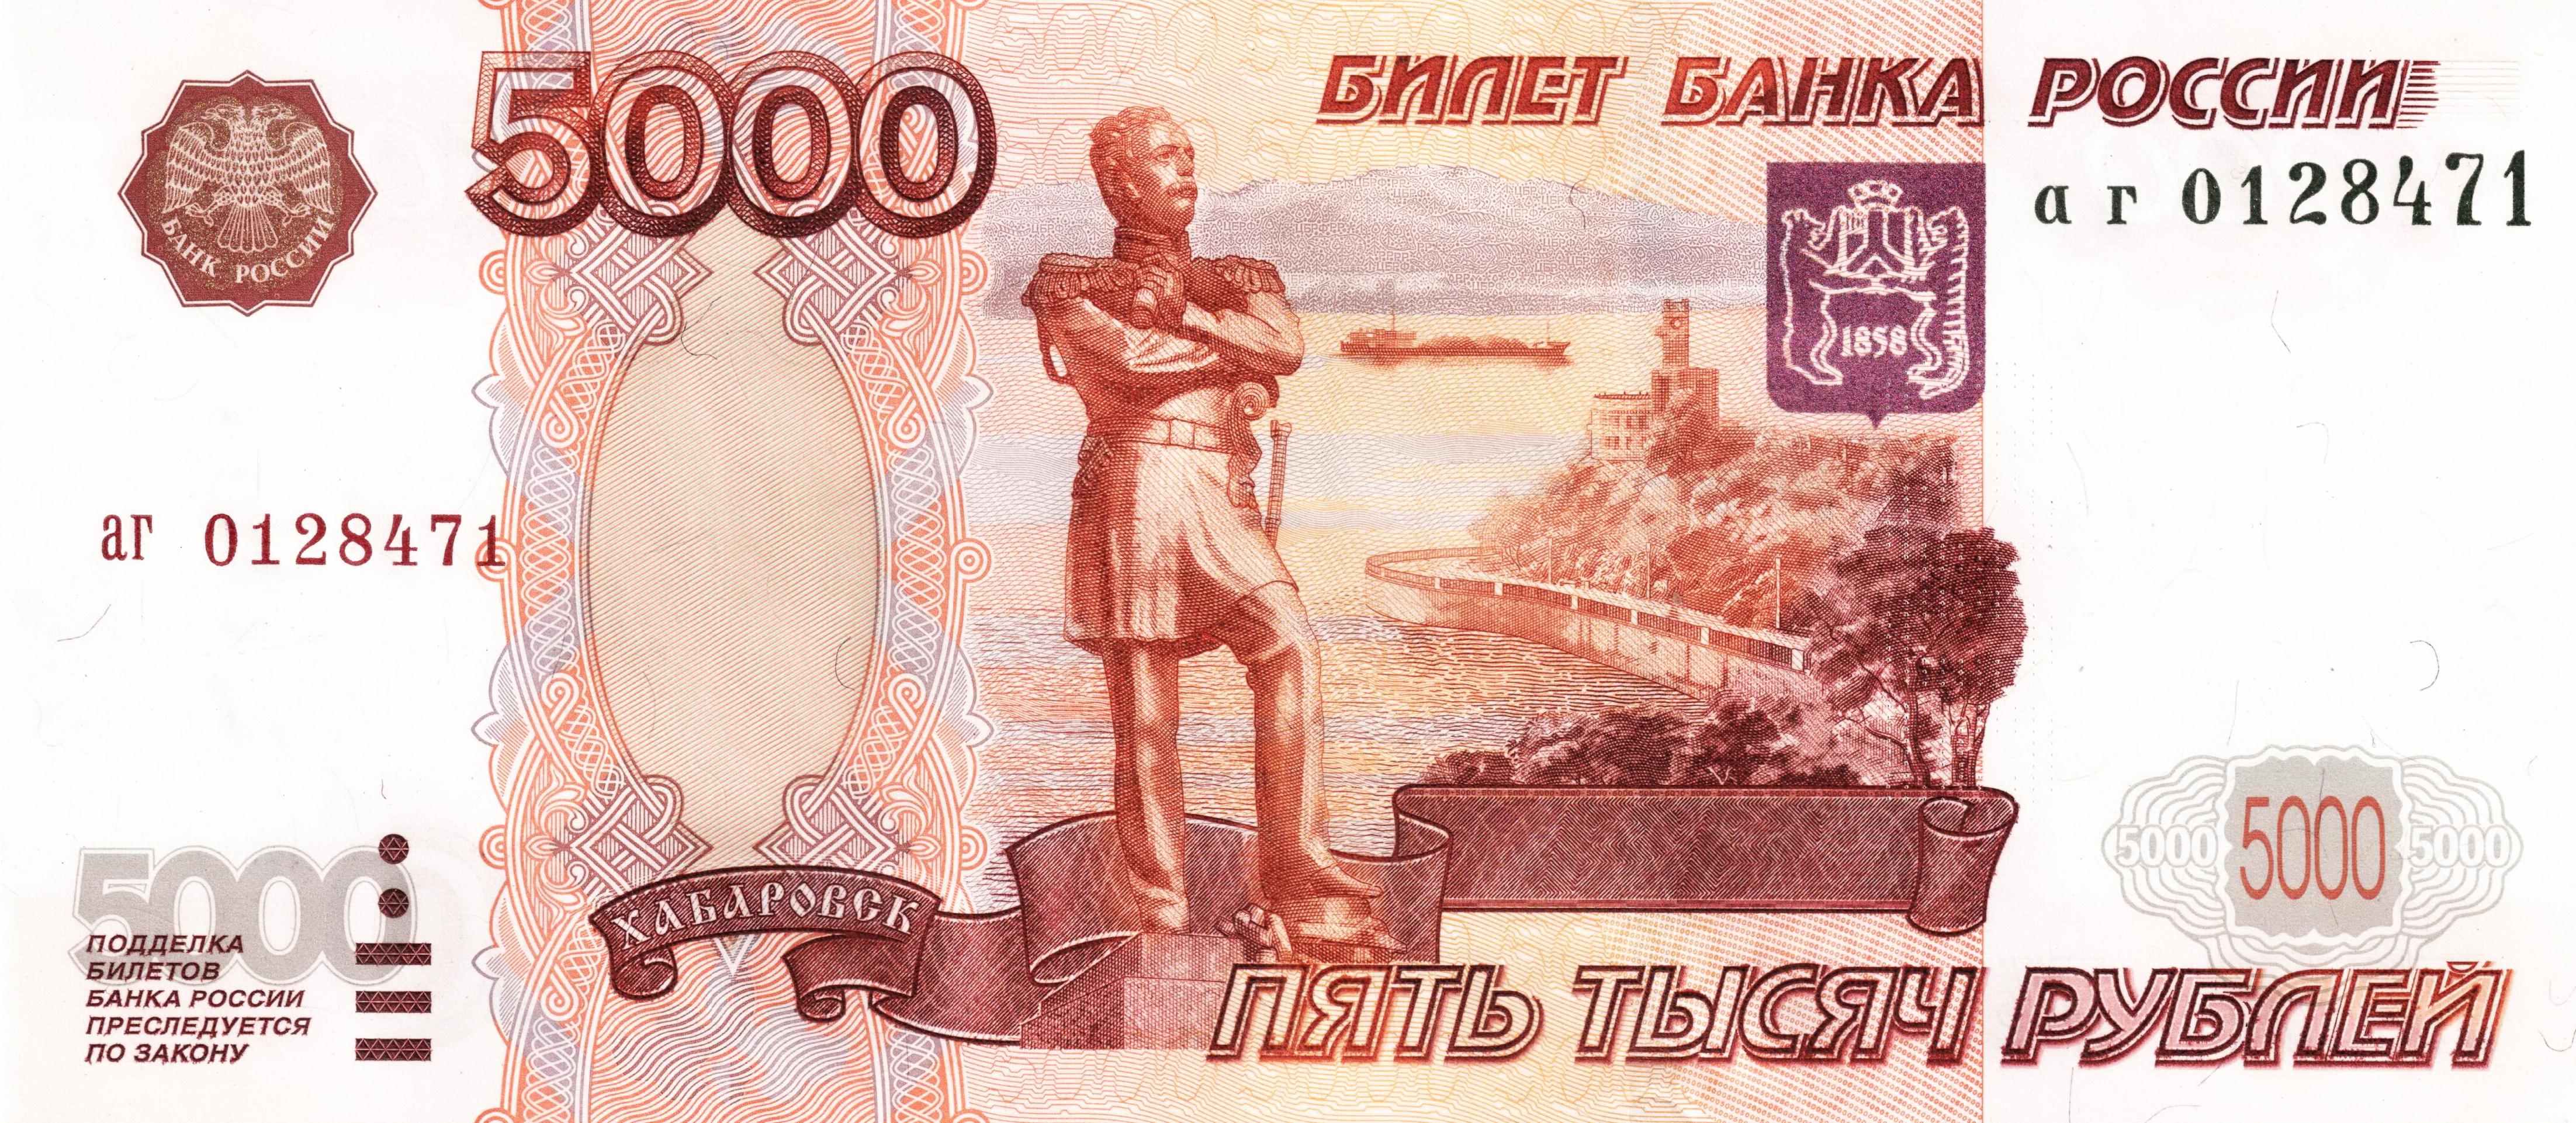 https://upload.wikimedia.org/wikipedia/commons/e/e3/Banknote_5000_rubles_%281997%29_front.jpg